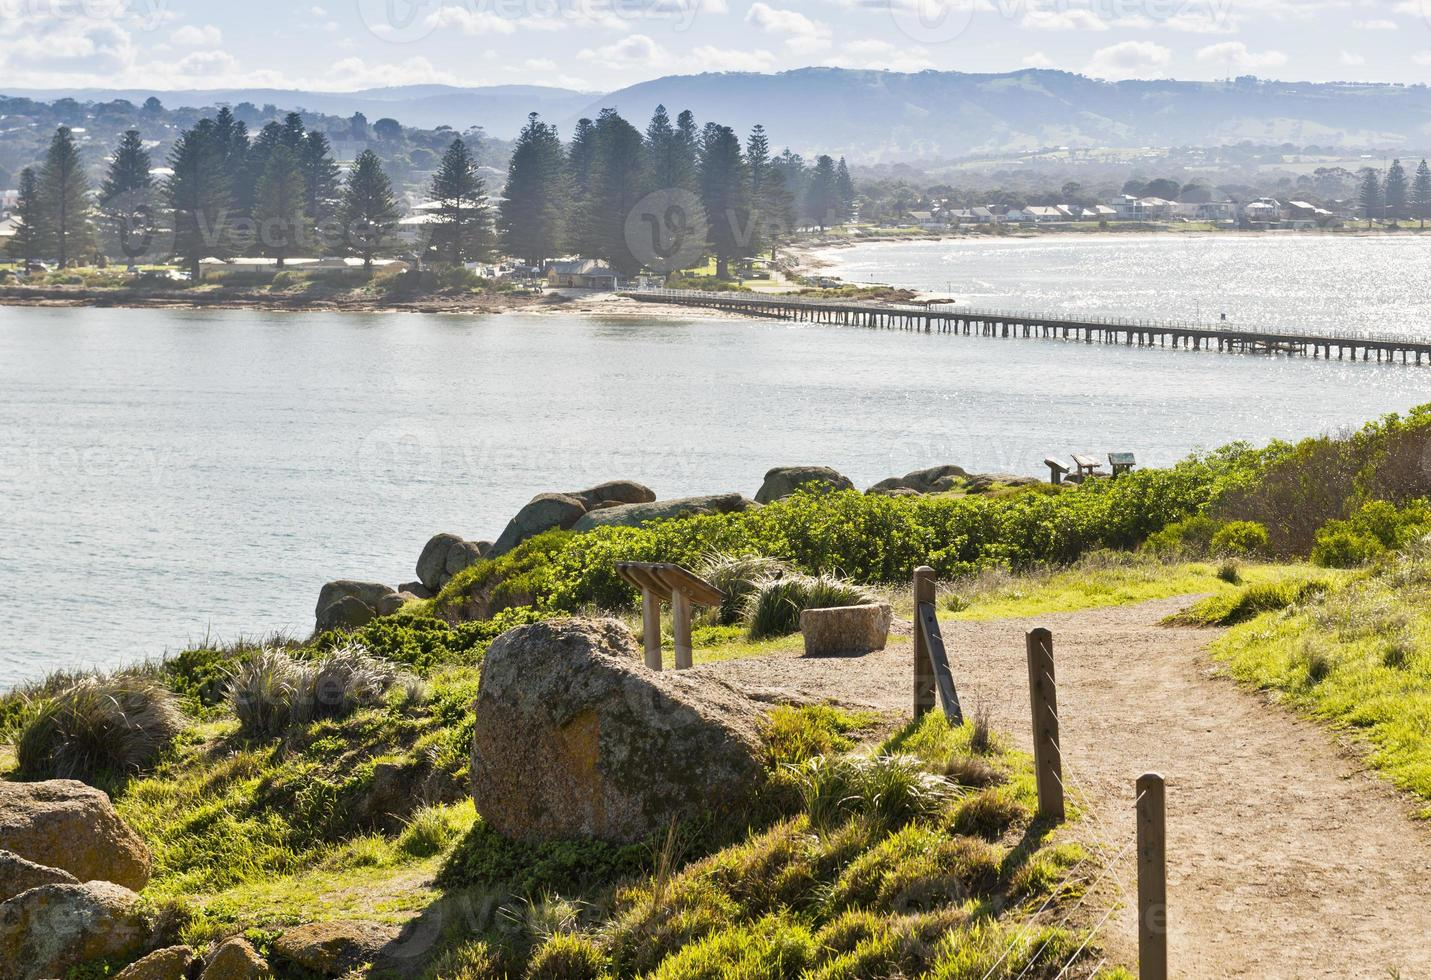 victor harbor, australia meridionale foto